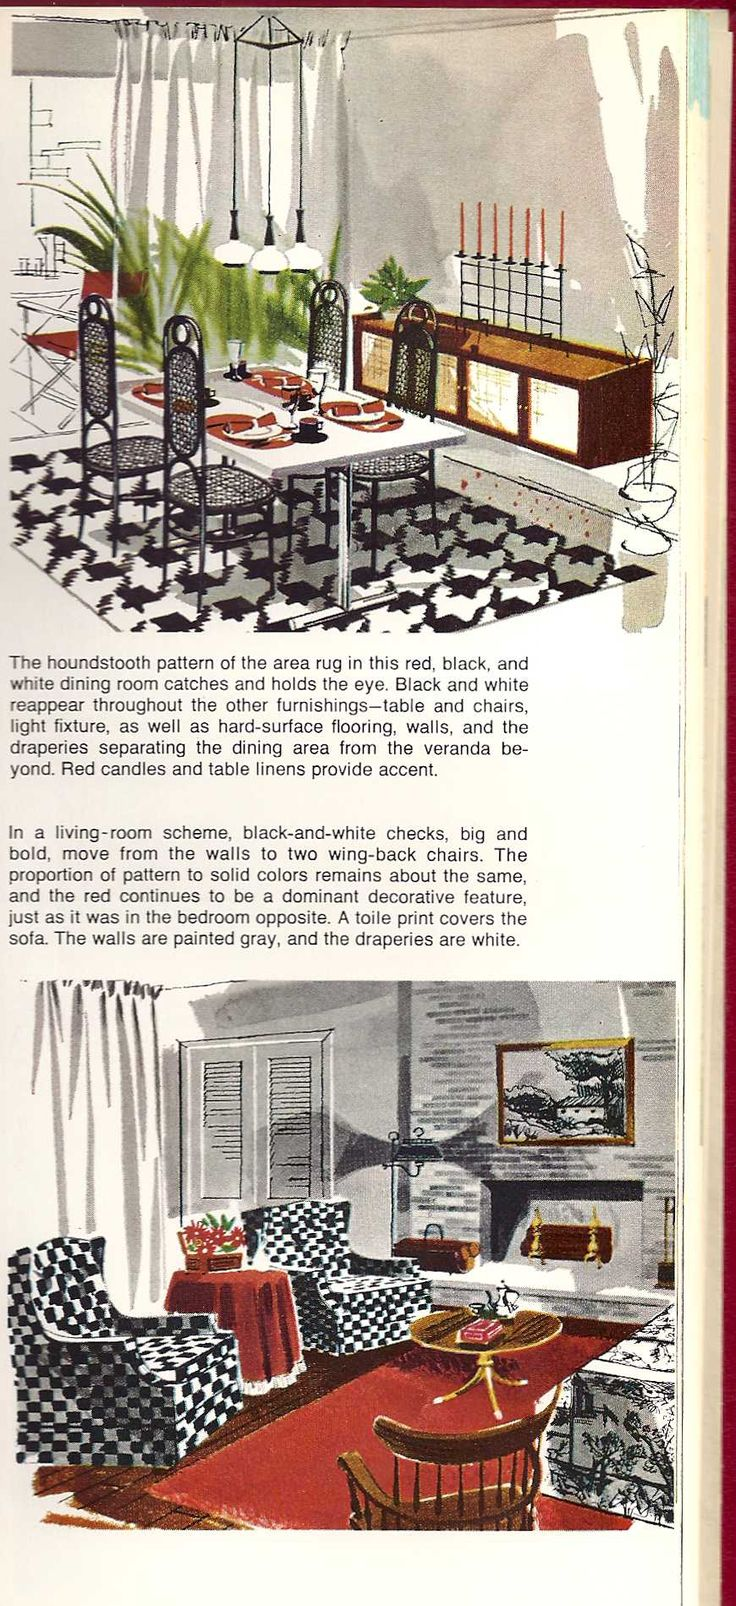 f15b7fd1d3b33b0f0f1e1ee0fe29b372 s decor interior design books